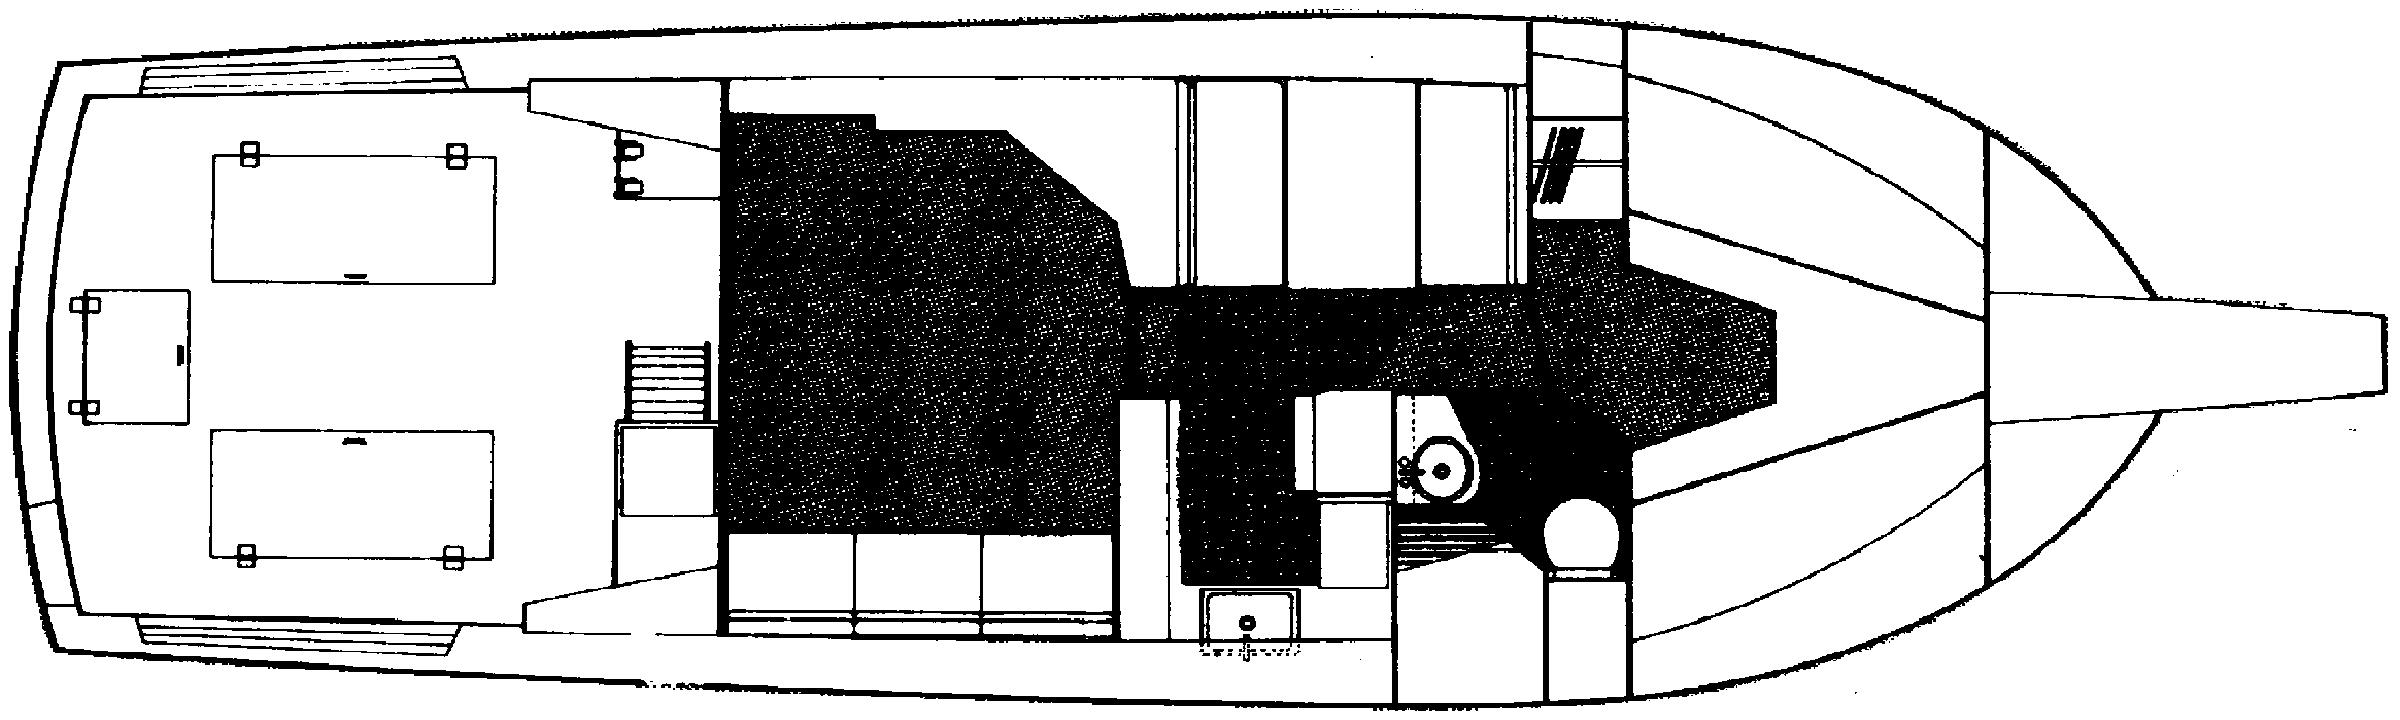 38 Flybridge Floor Plan 2